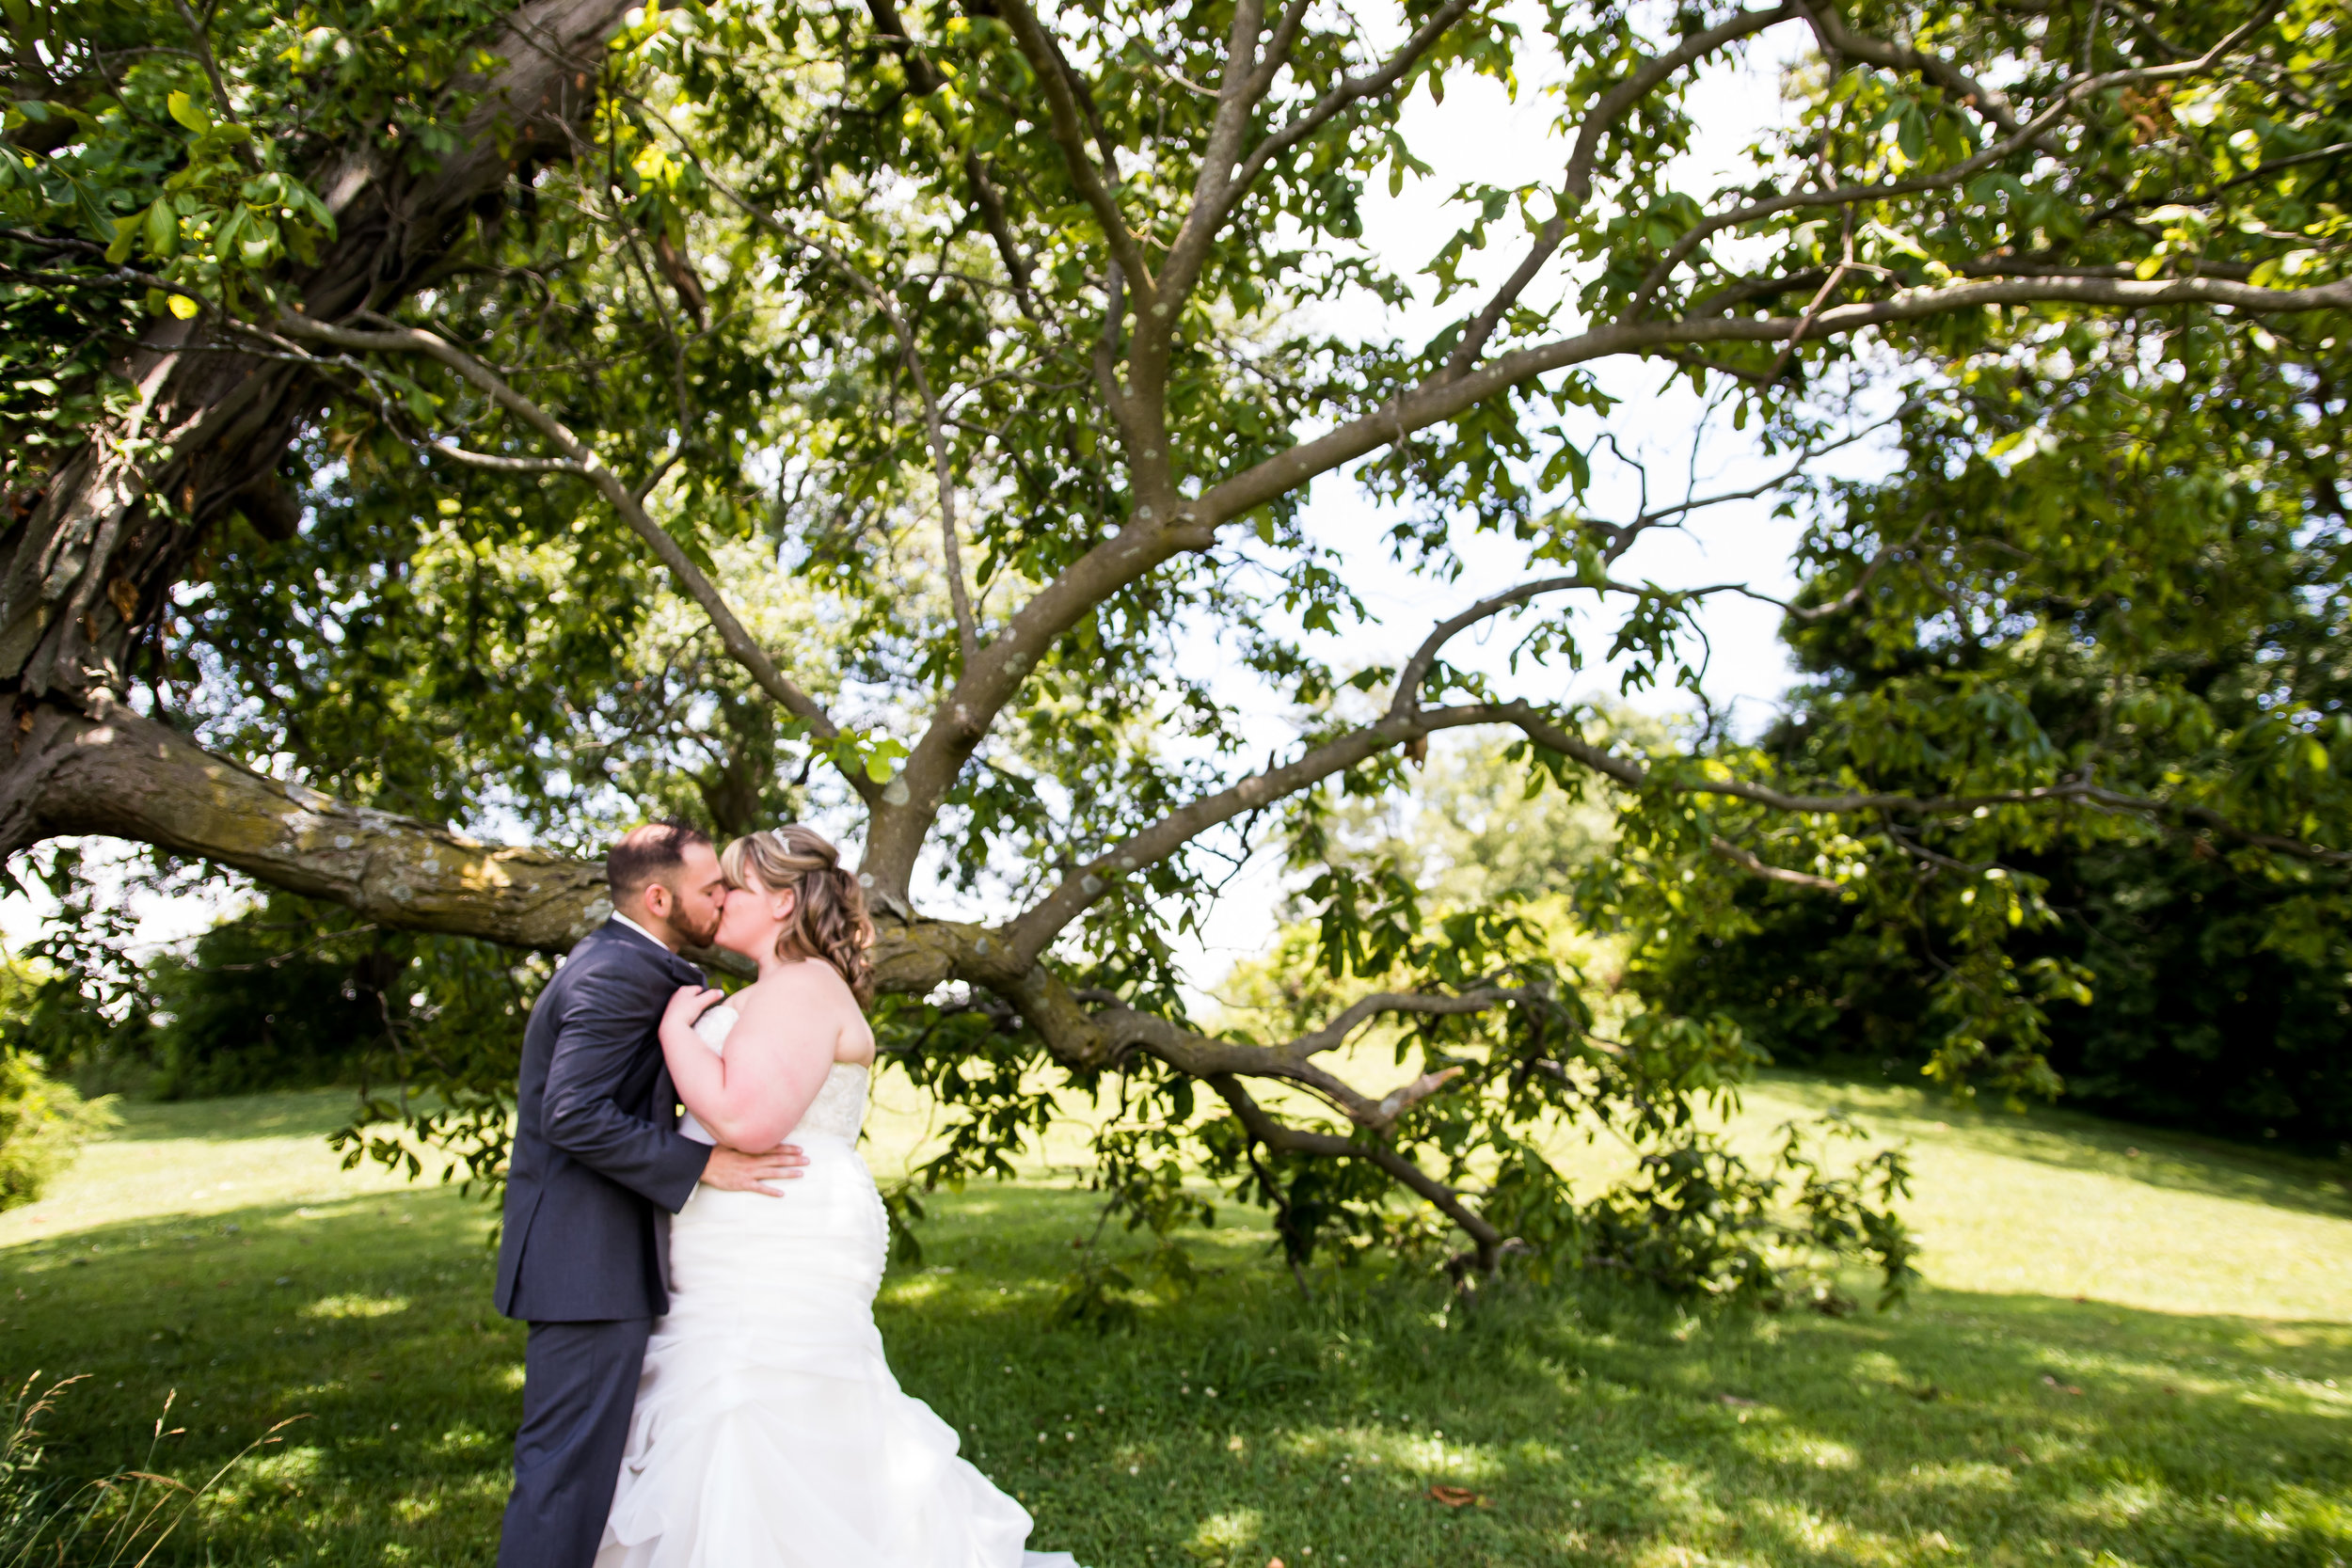 Wedding_Photography_Ward-453.jpg